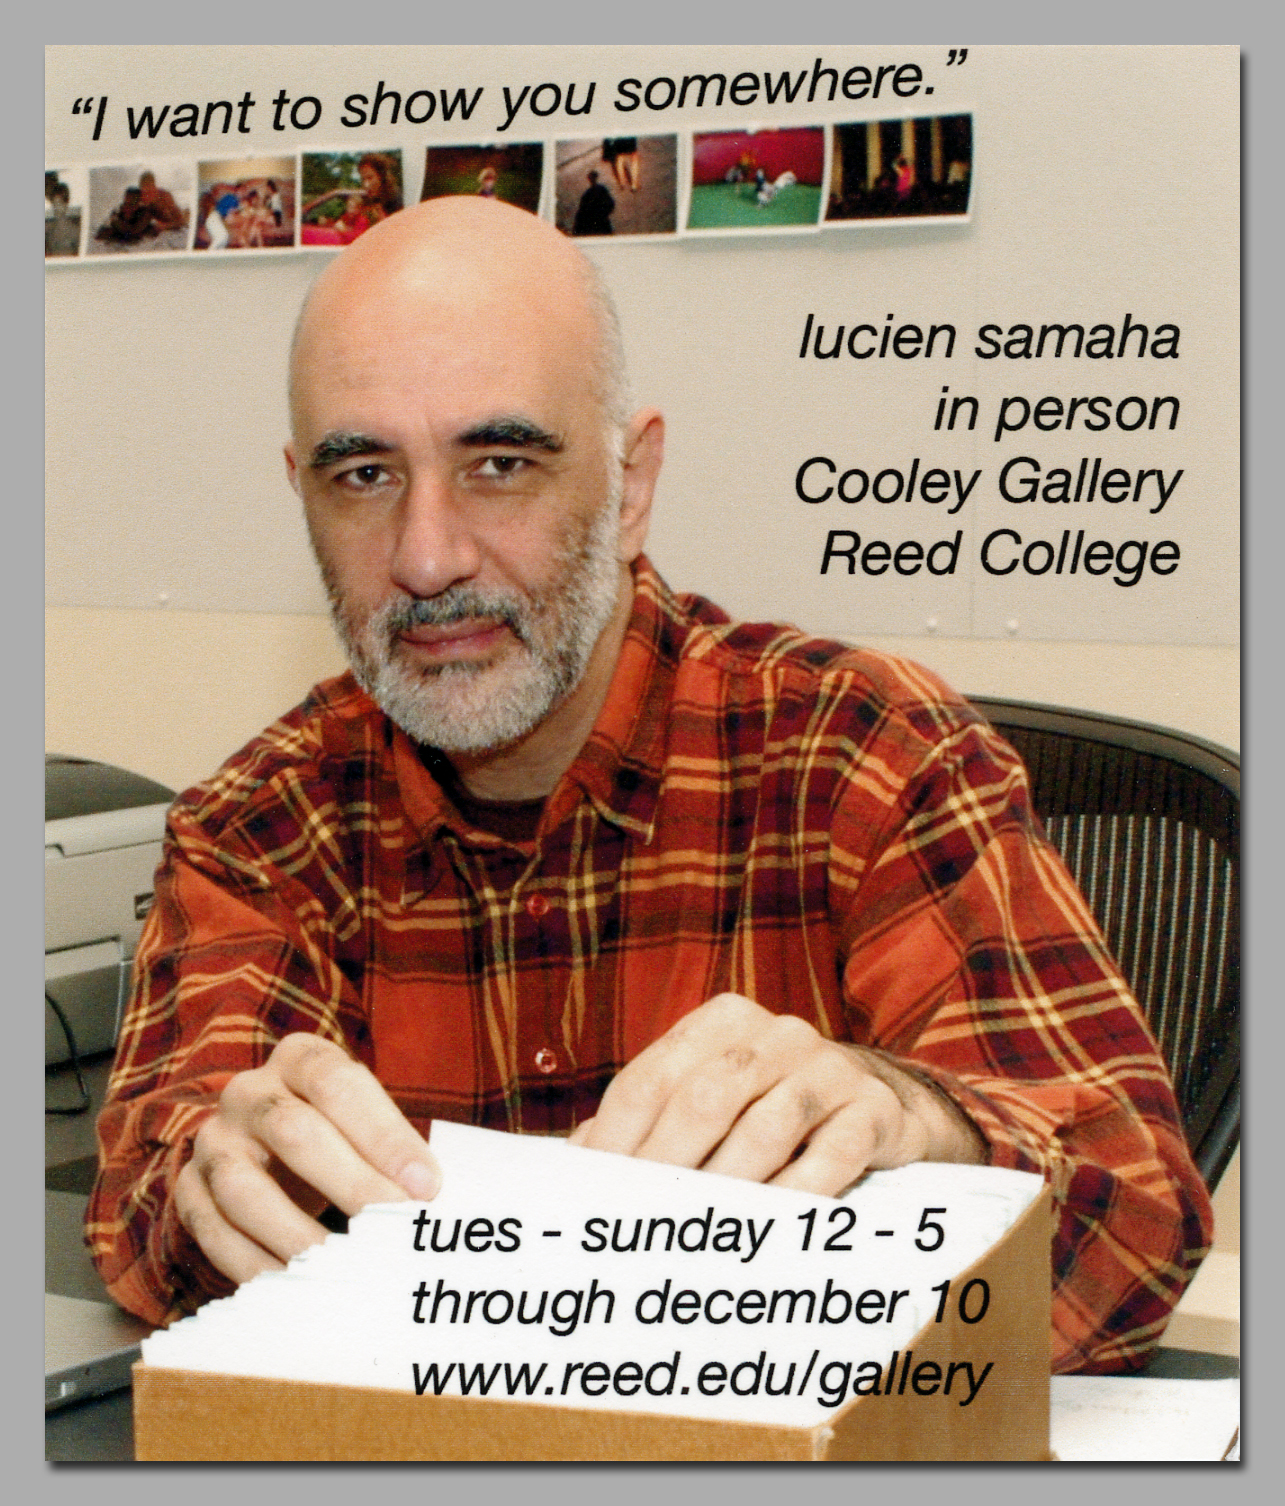 Lucien Samaha - I want to show you somewhere.jpg